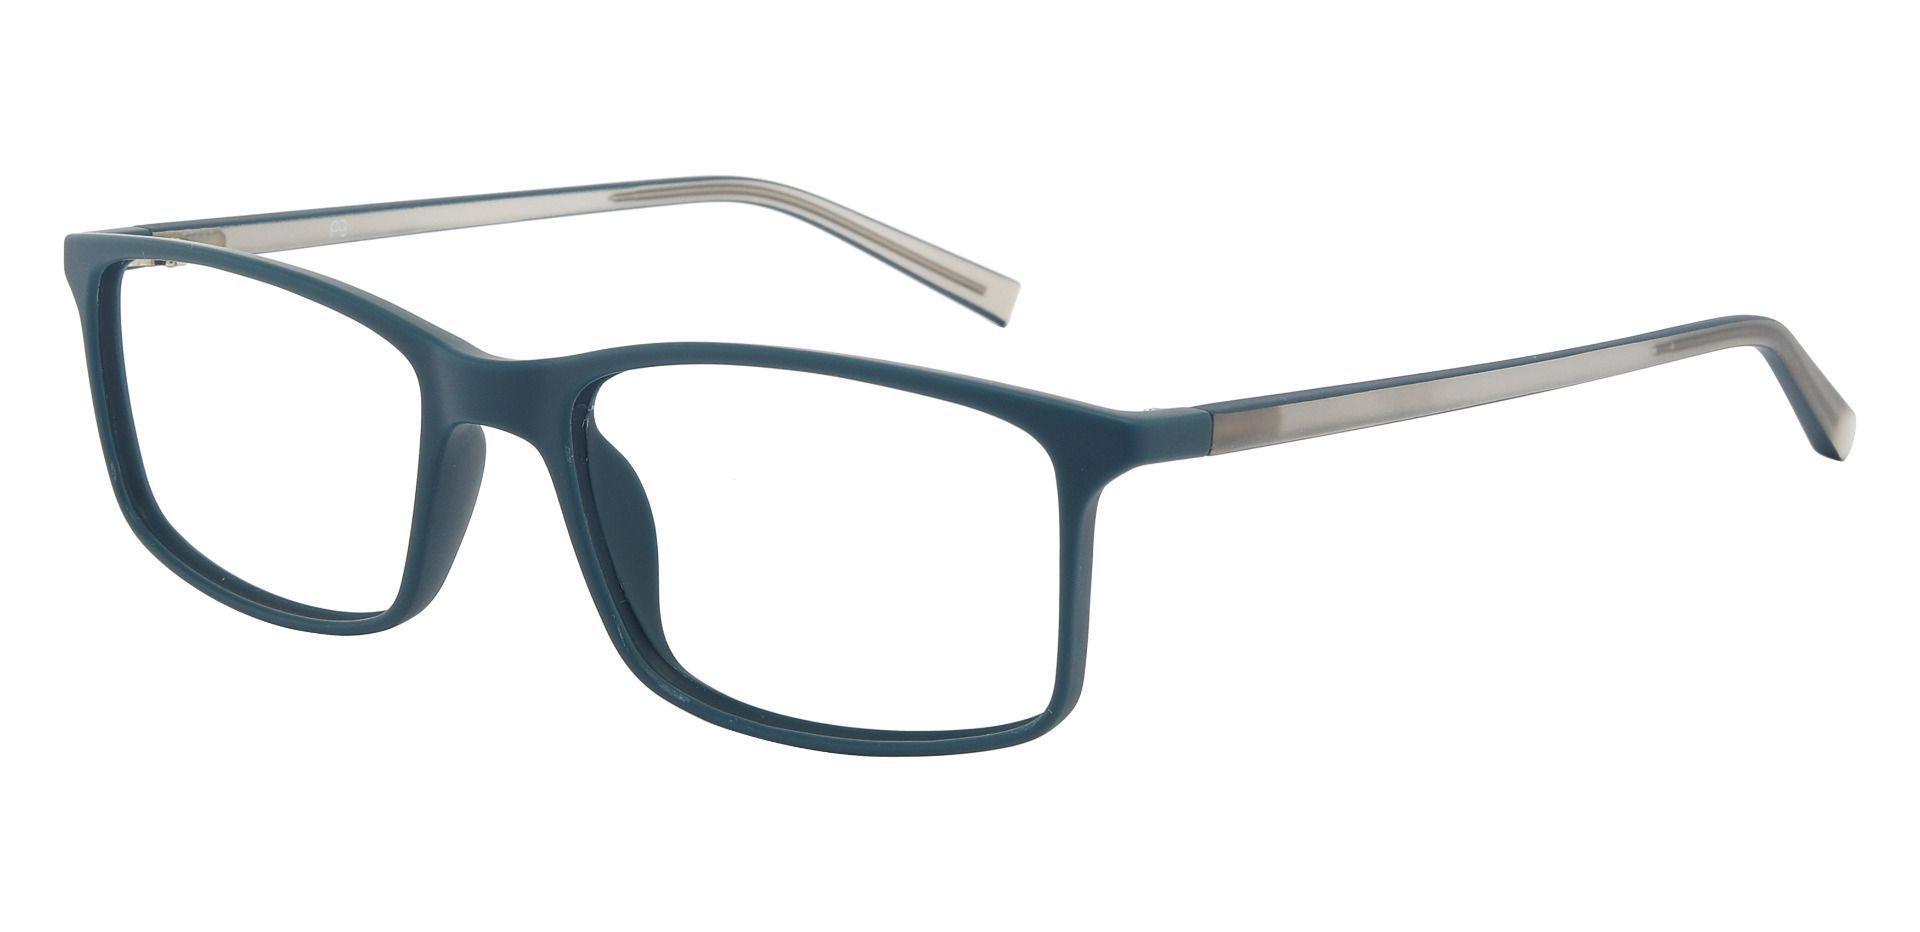 Callaway Rectangle Prescription Glasses - Green